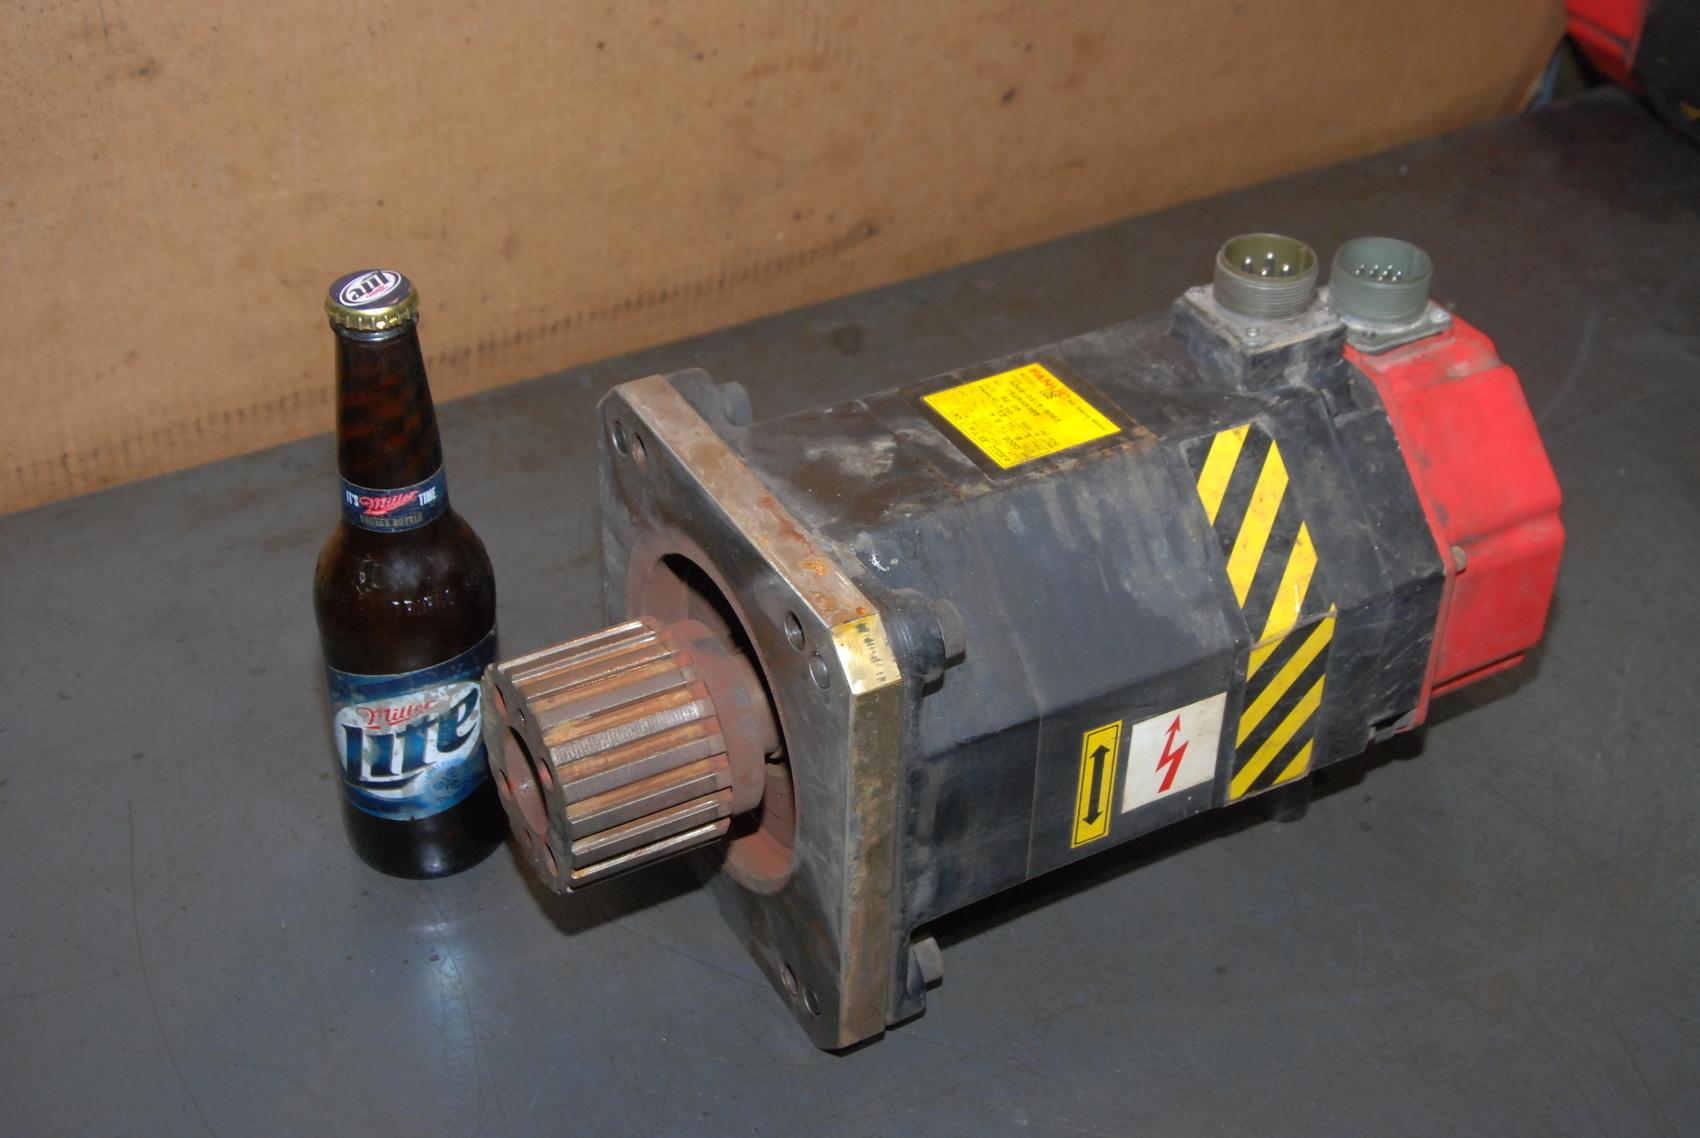 fanuc red cap ac servo motor model 10s a06b-0315-b063